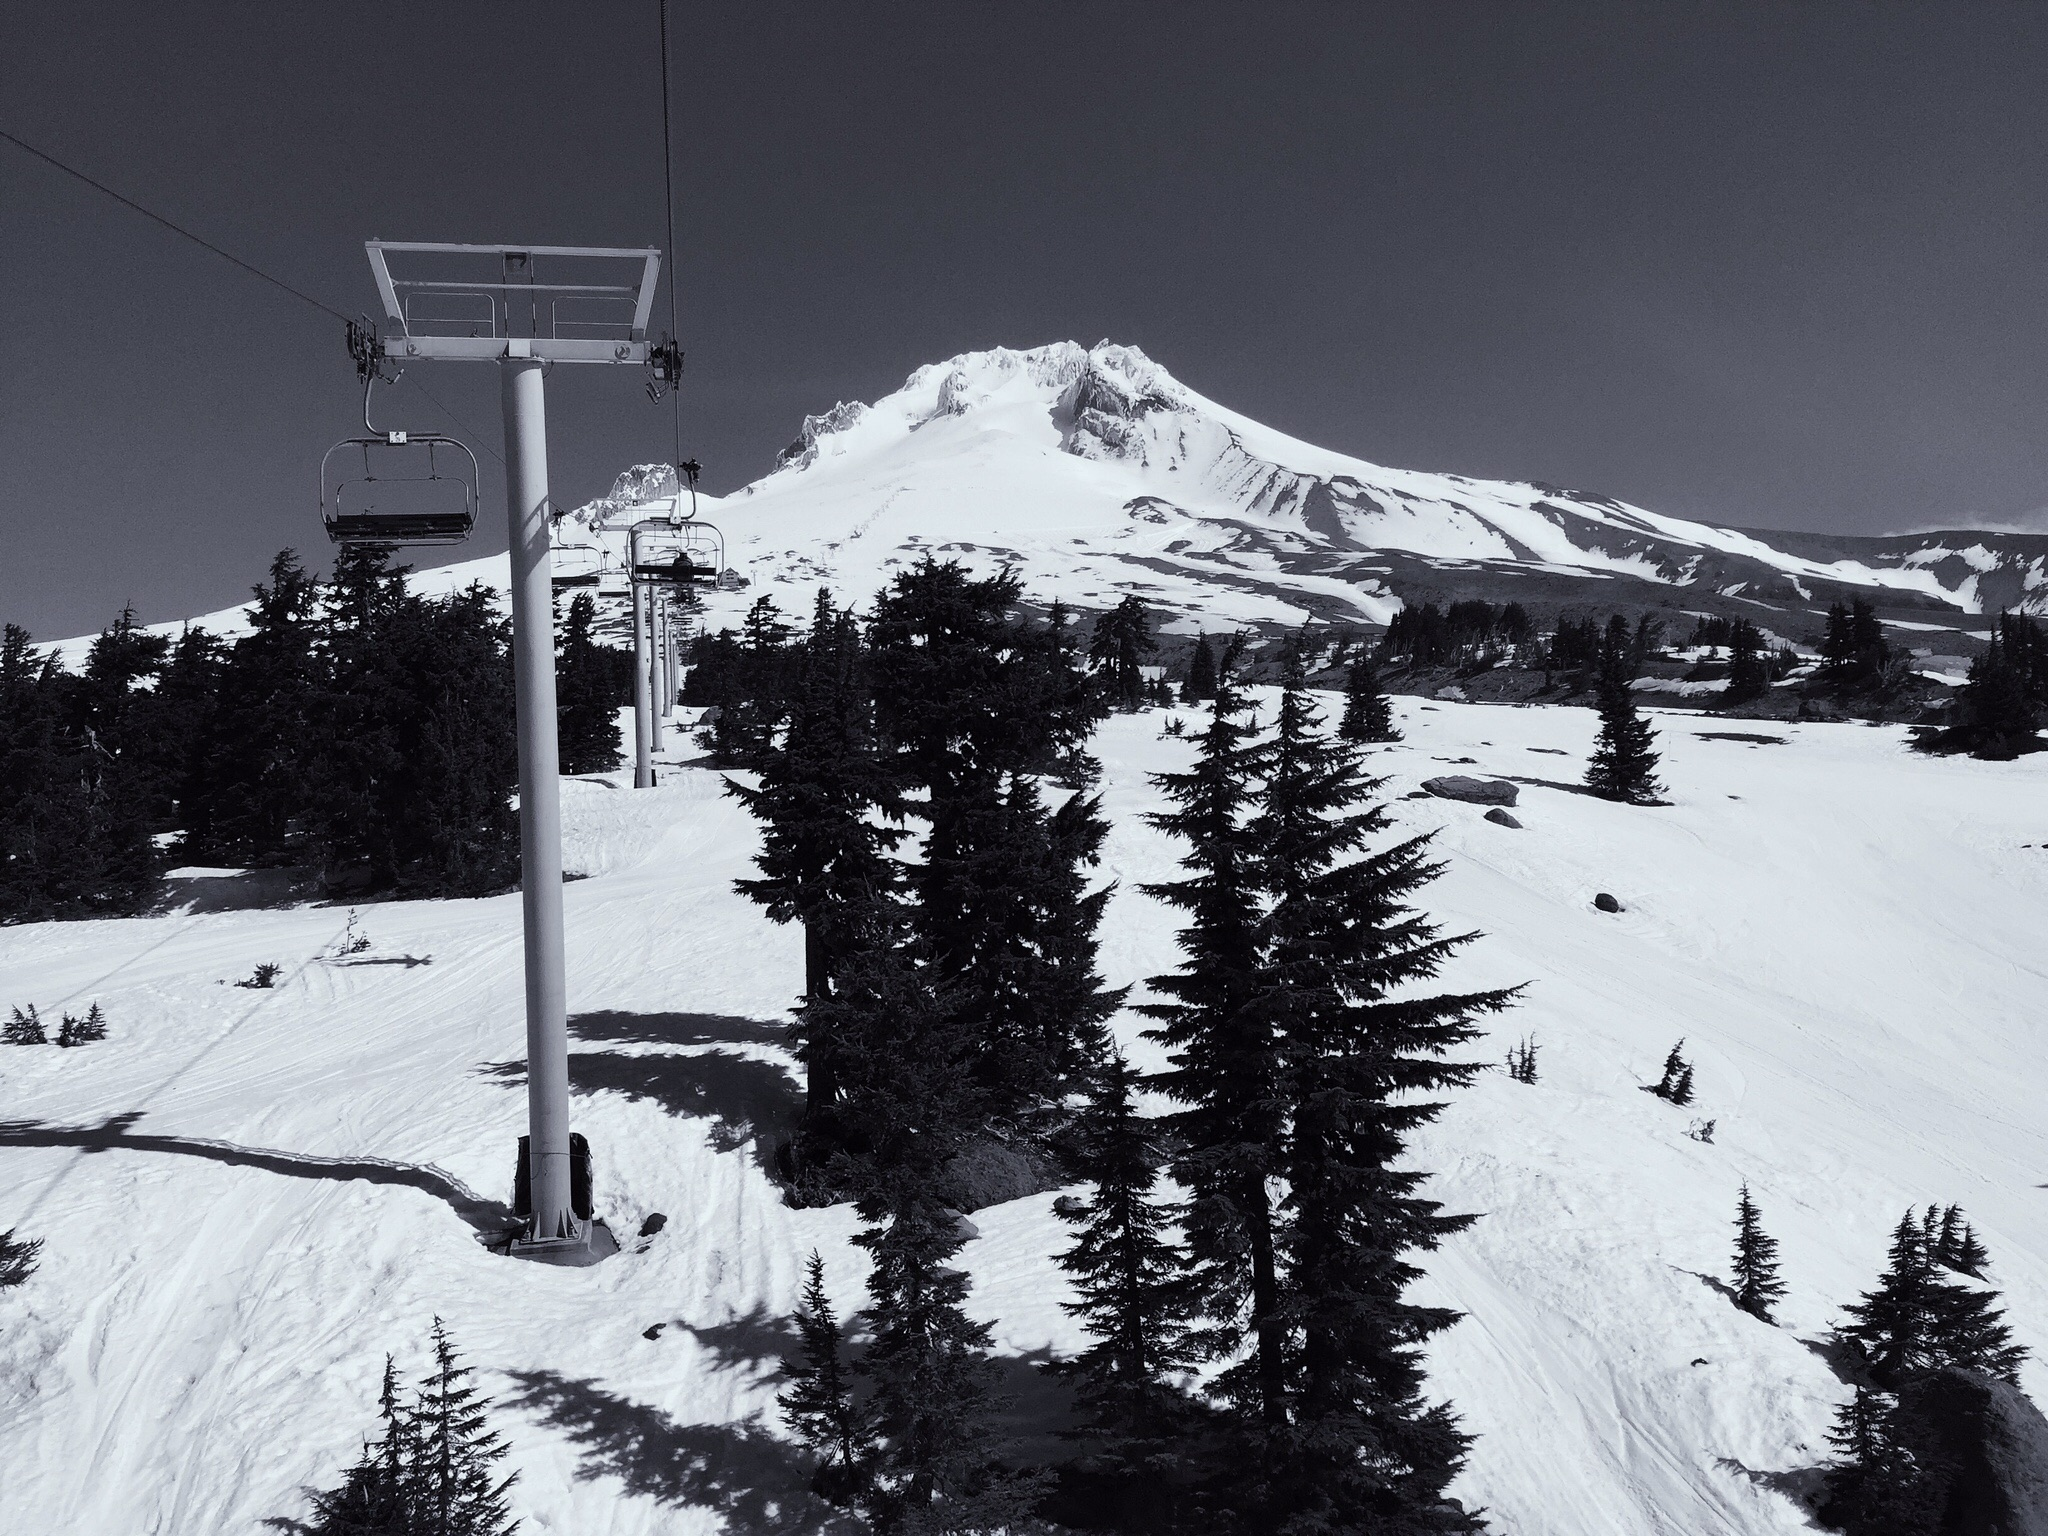 Ski lift on Mount Hood